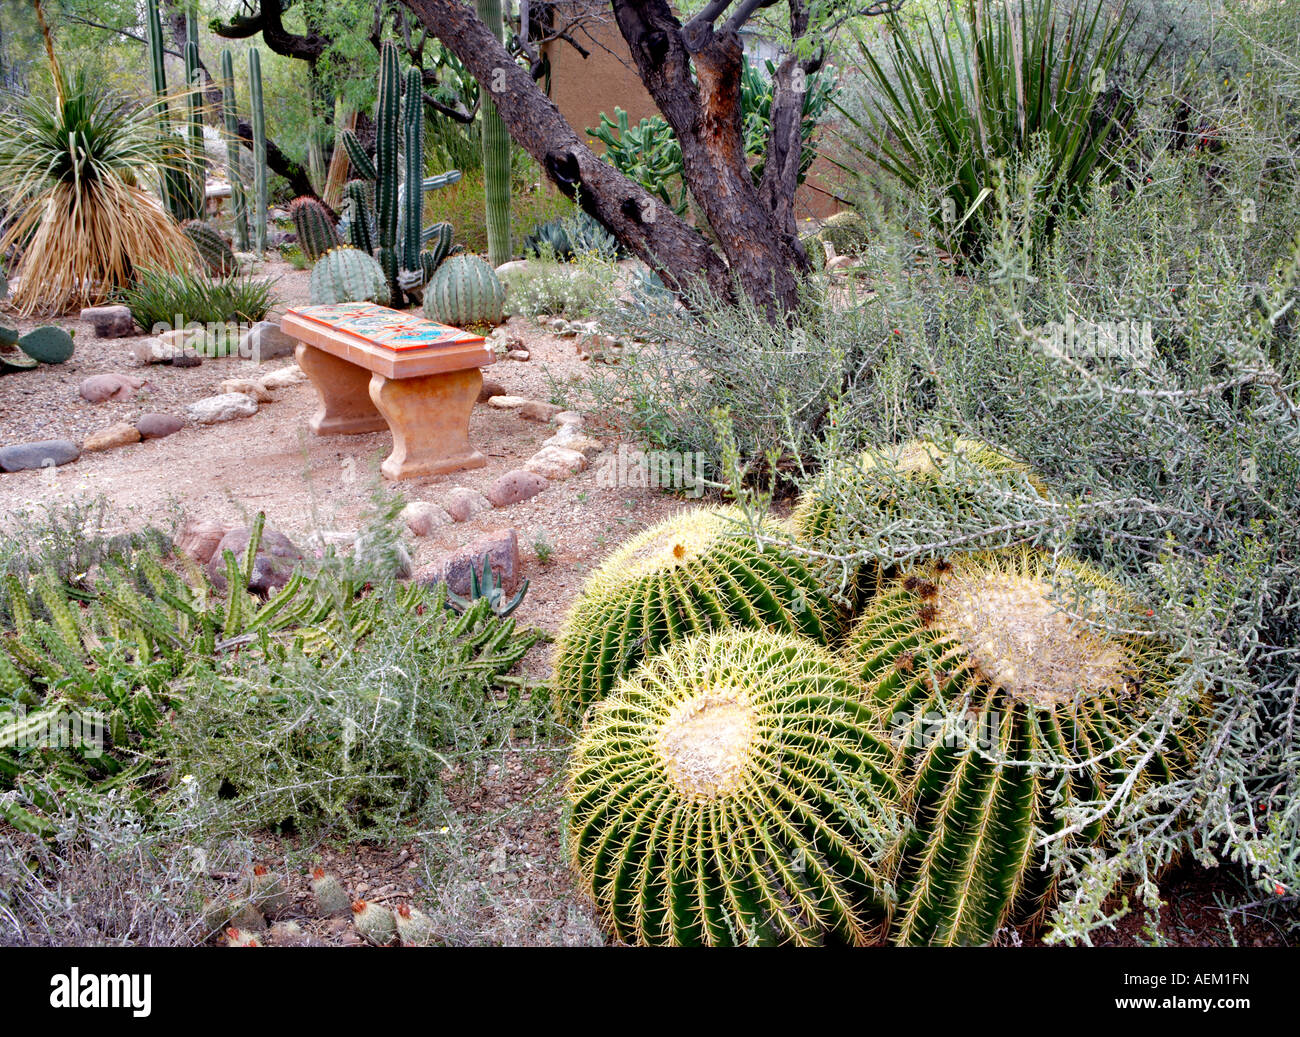 Cactus Garden With Bench In Tucson Botanical Gardens Tucson Arizona